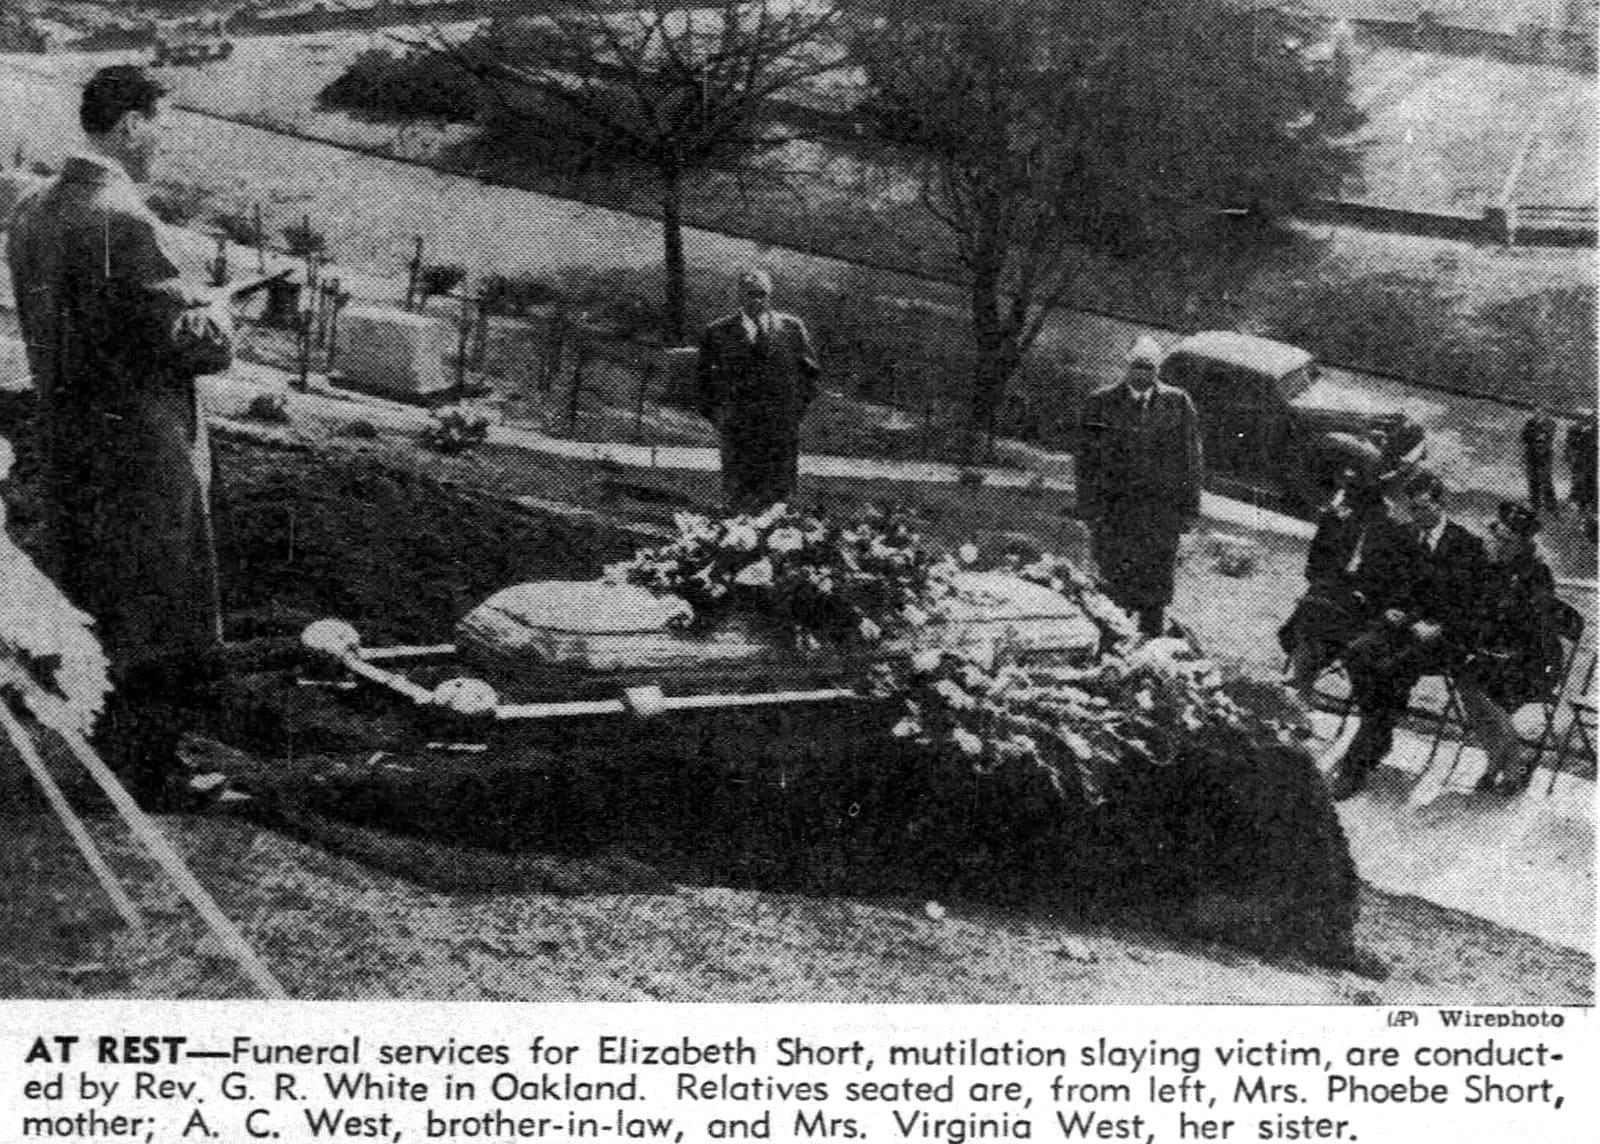 Black Dahlia - Elizabeth Short graveside funeral services in Oakland - January 26 1947